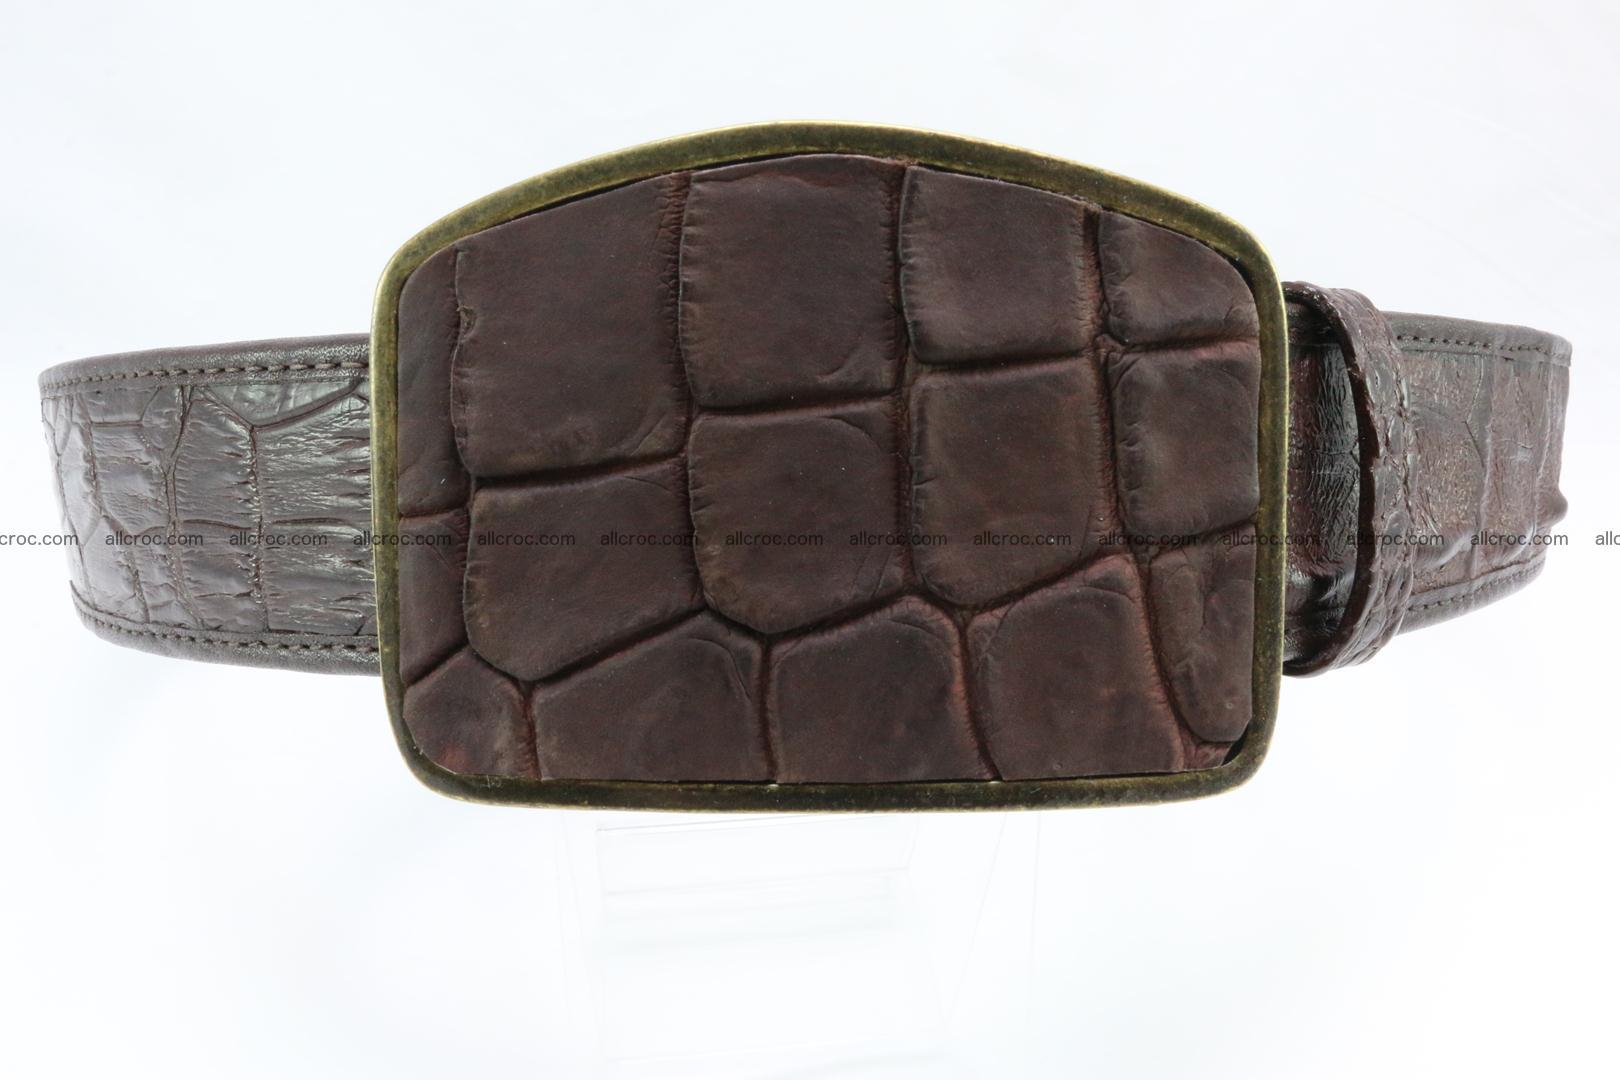 Genuine crocodile leather hornback belt 084 Foto 0